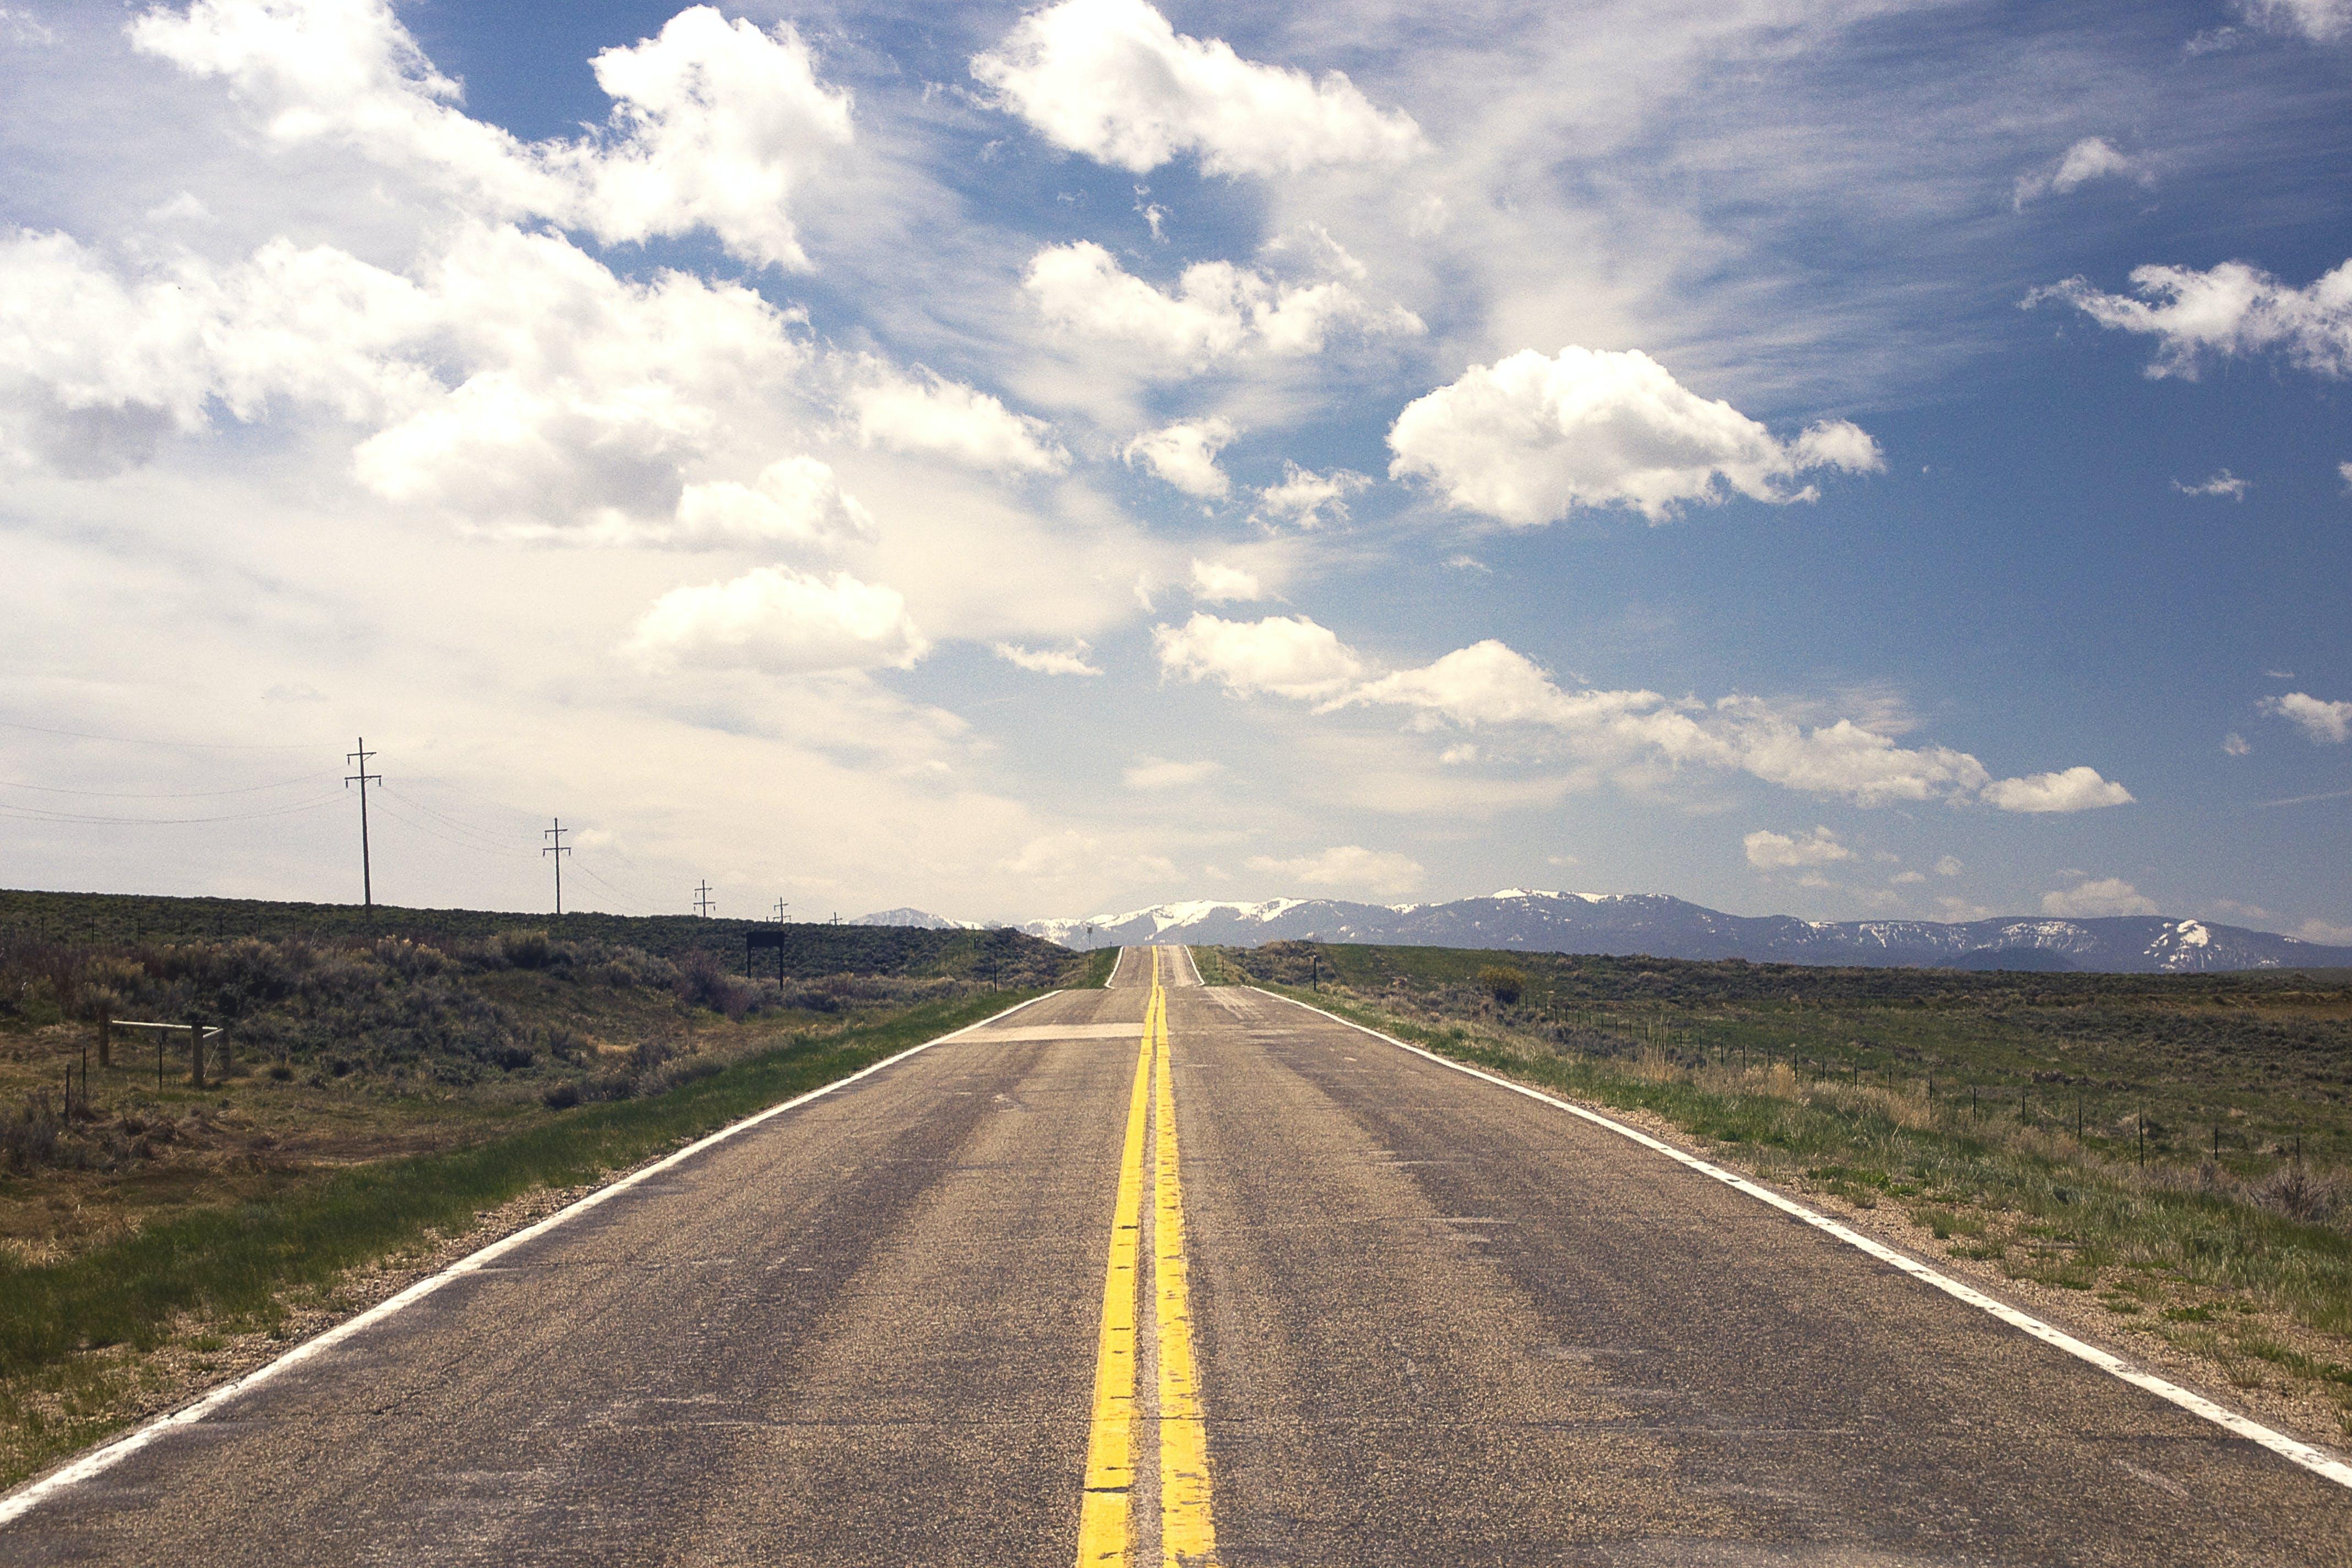 Kostenloses Stock Foto zu asphalt, aspiration, autobahn, berg